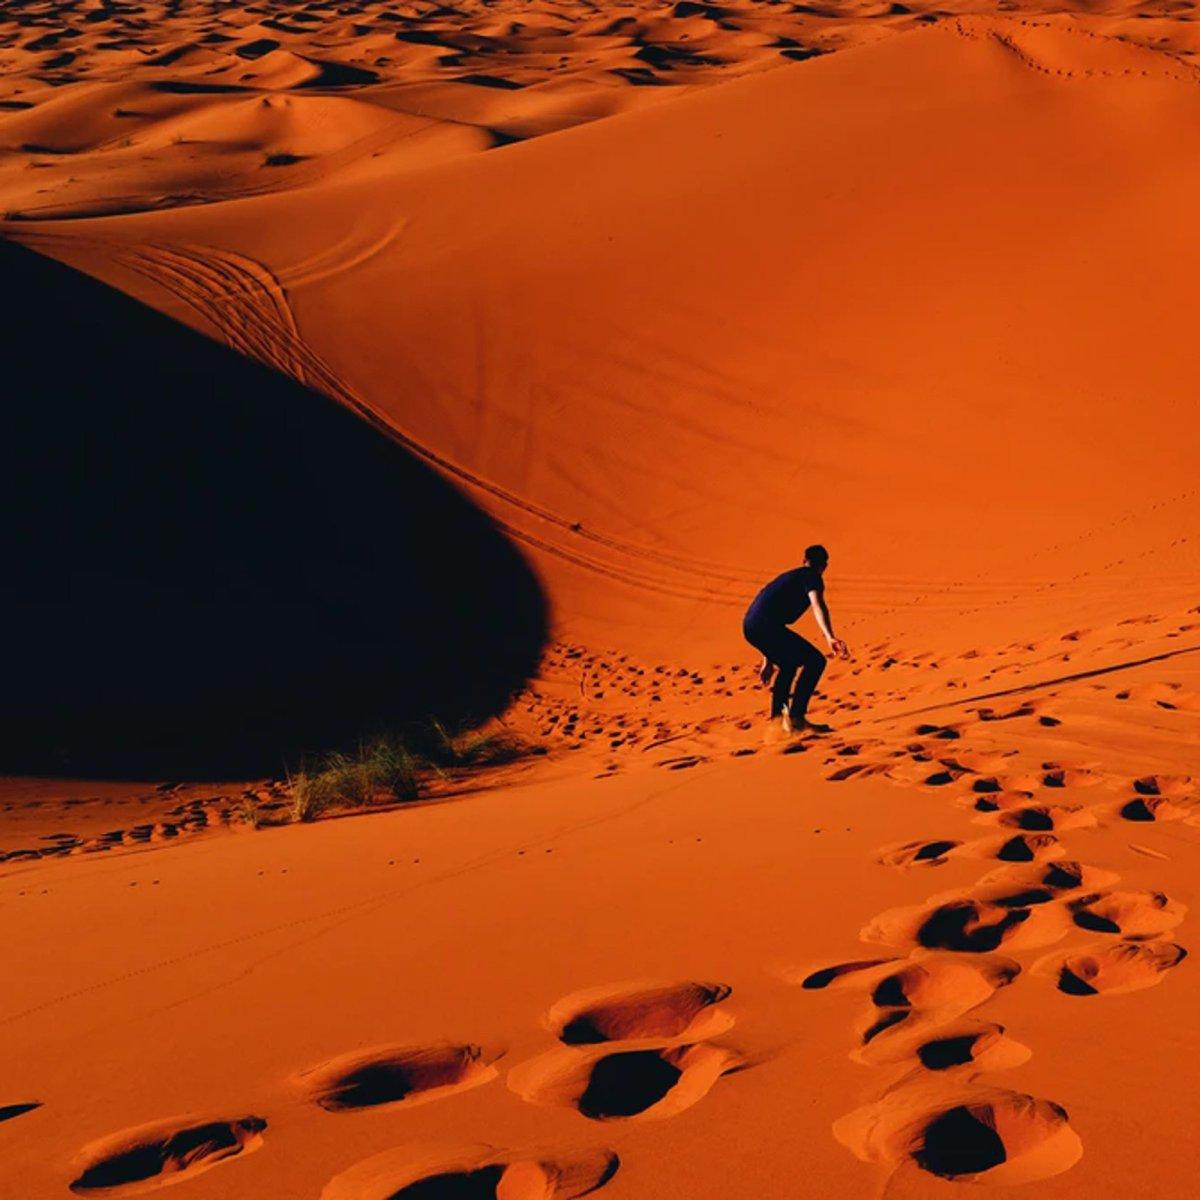 Sandsurfing in the Sahara